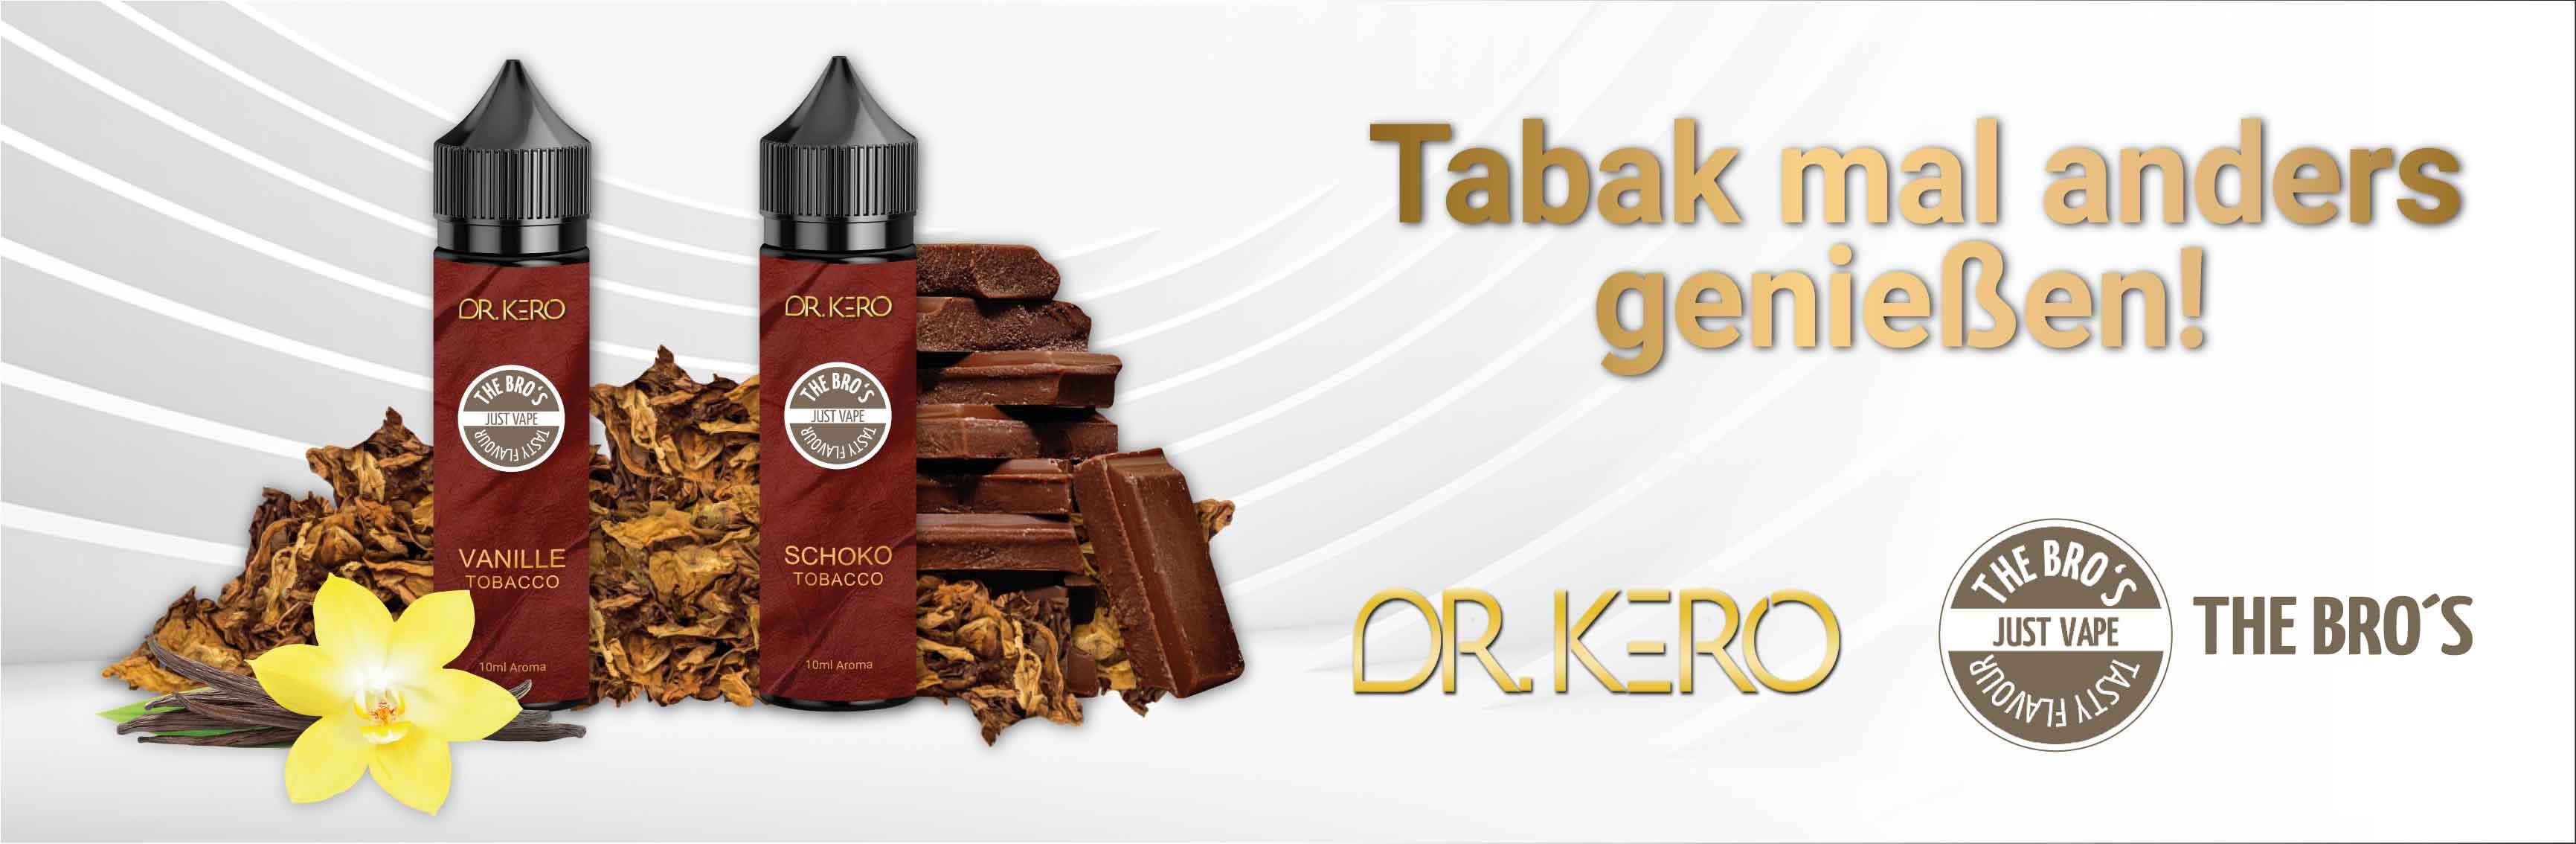 Dr-Kero-The-Bro-s-Tabak-Aromen